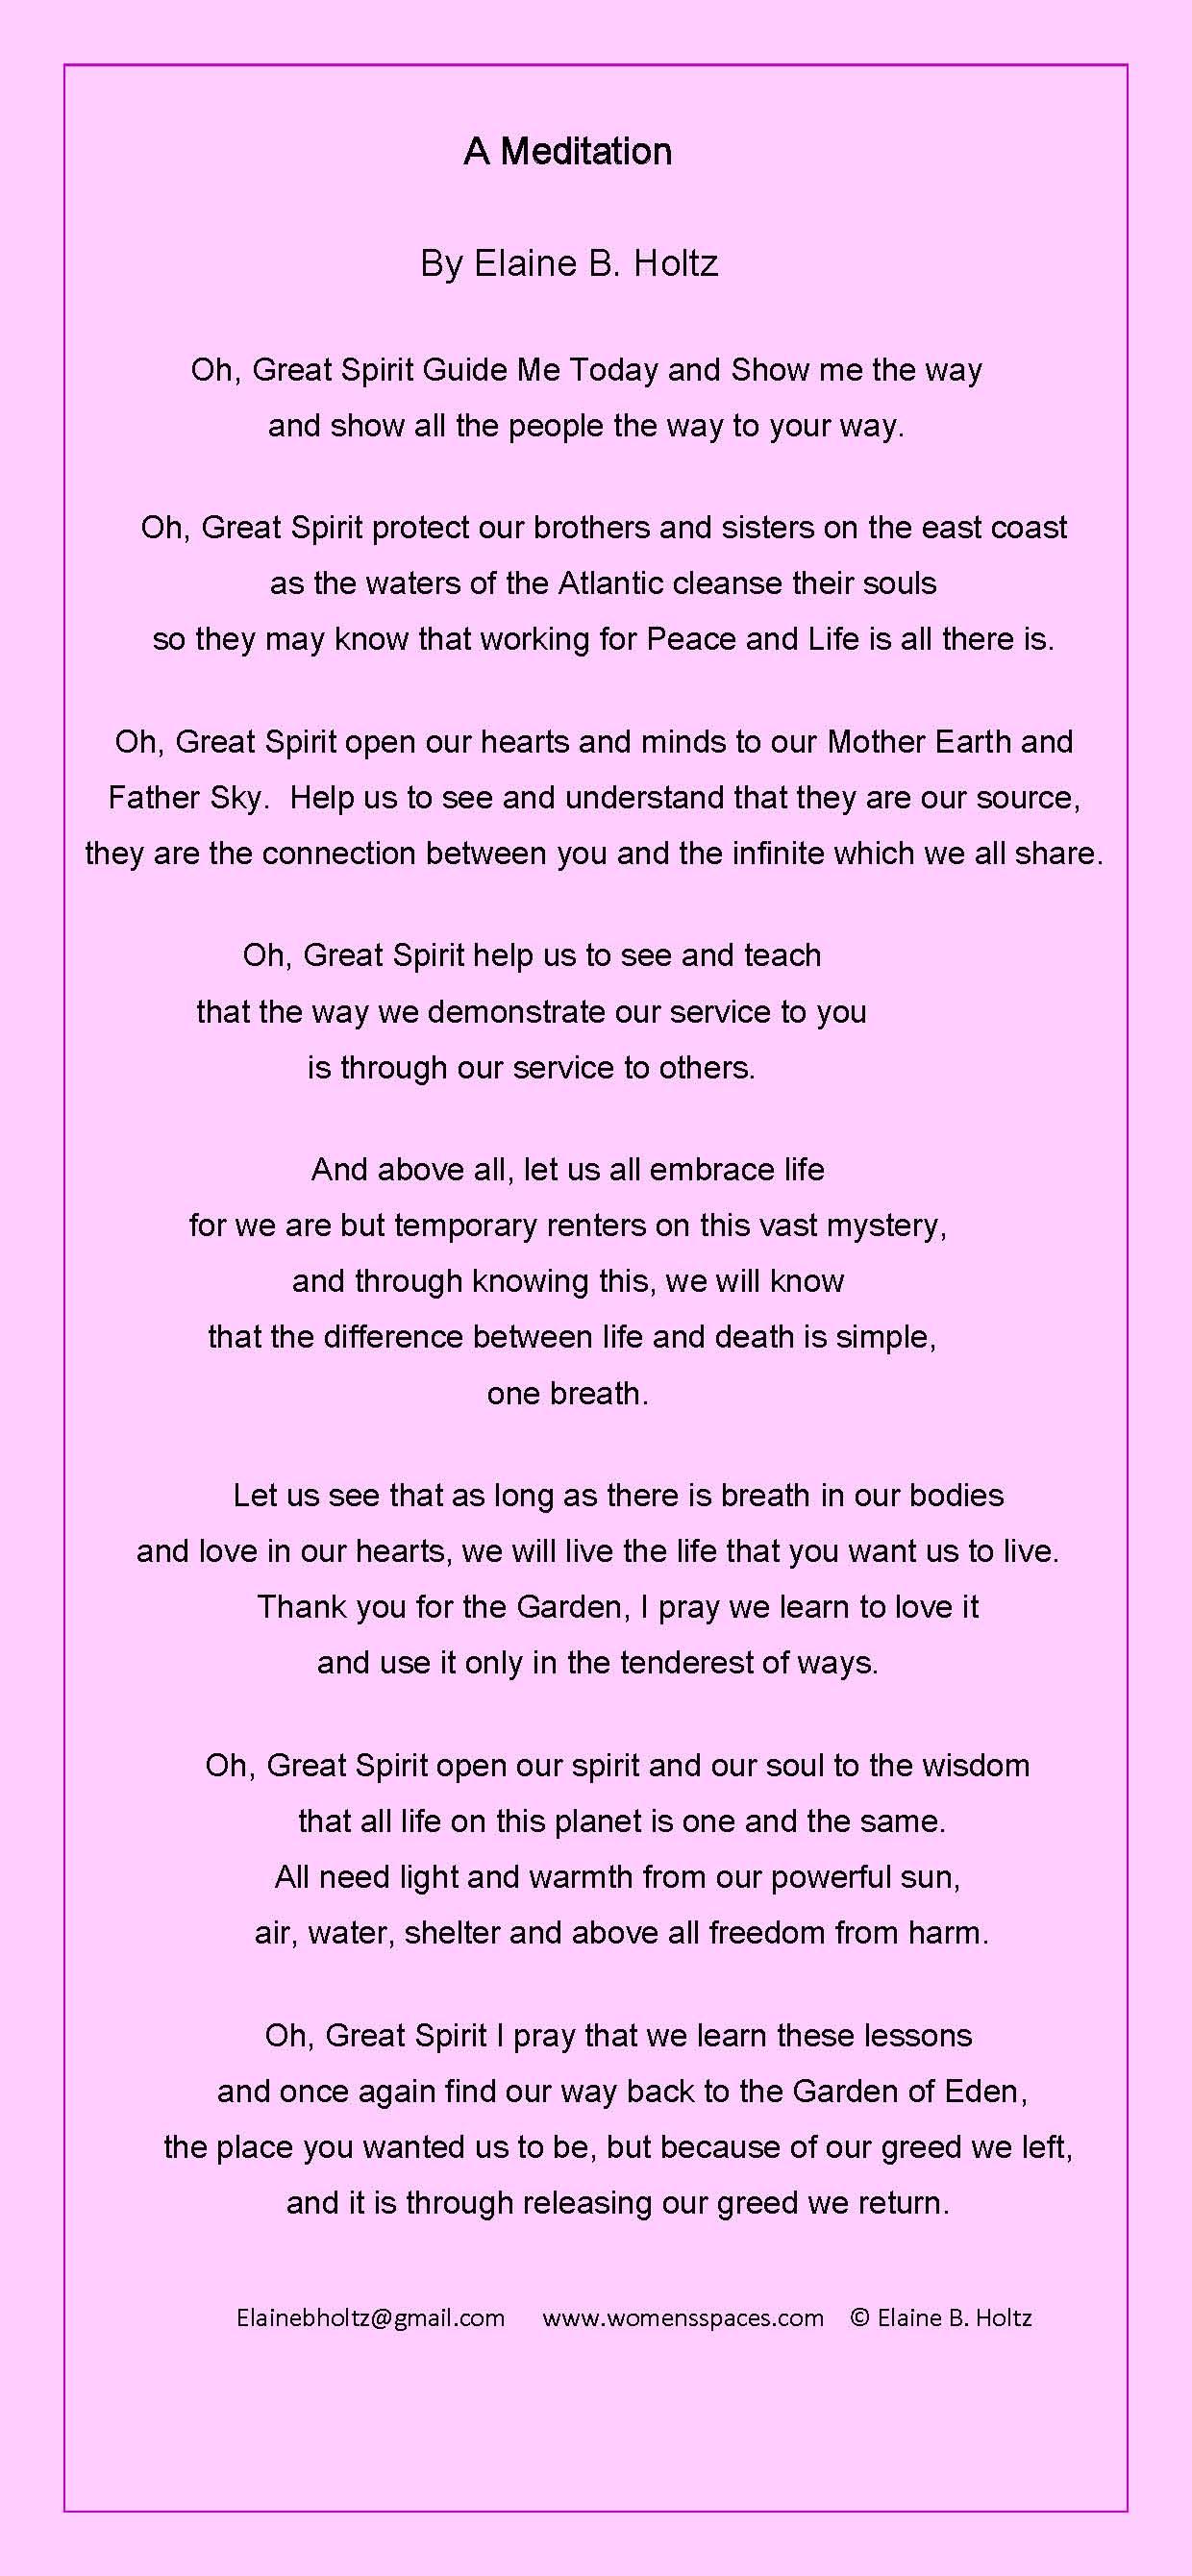 A Meditation by Elaine B. Holtz